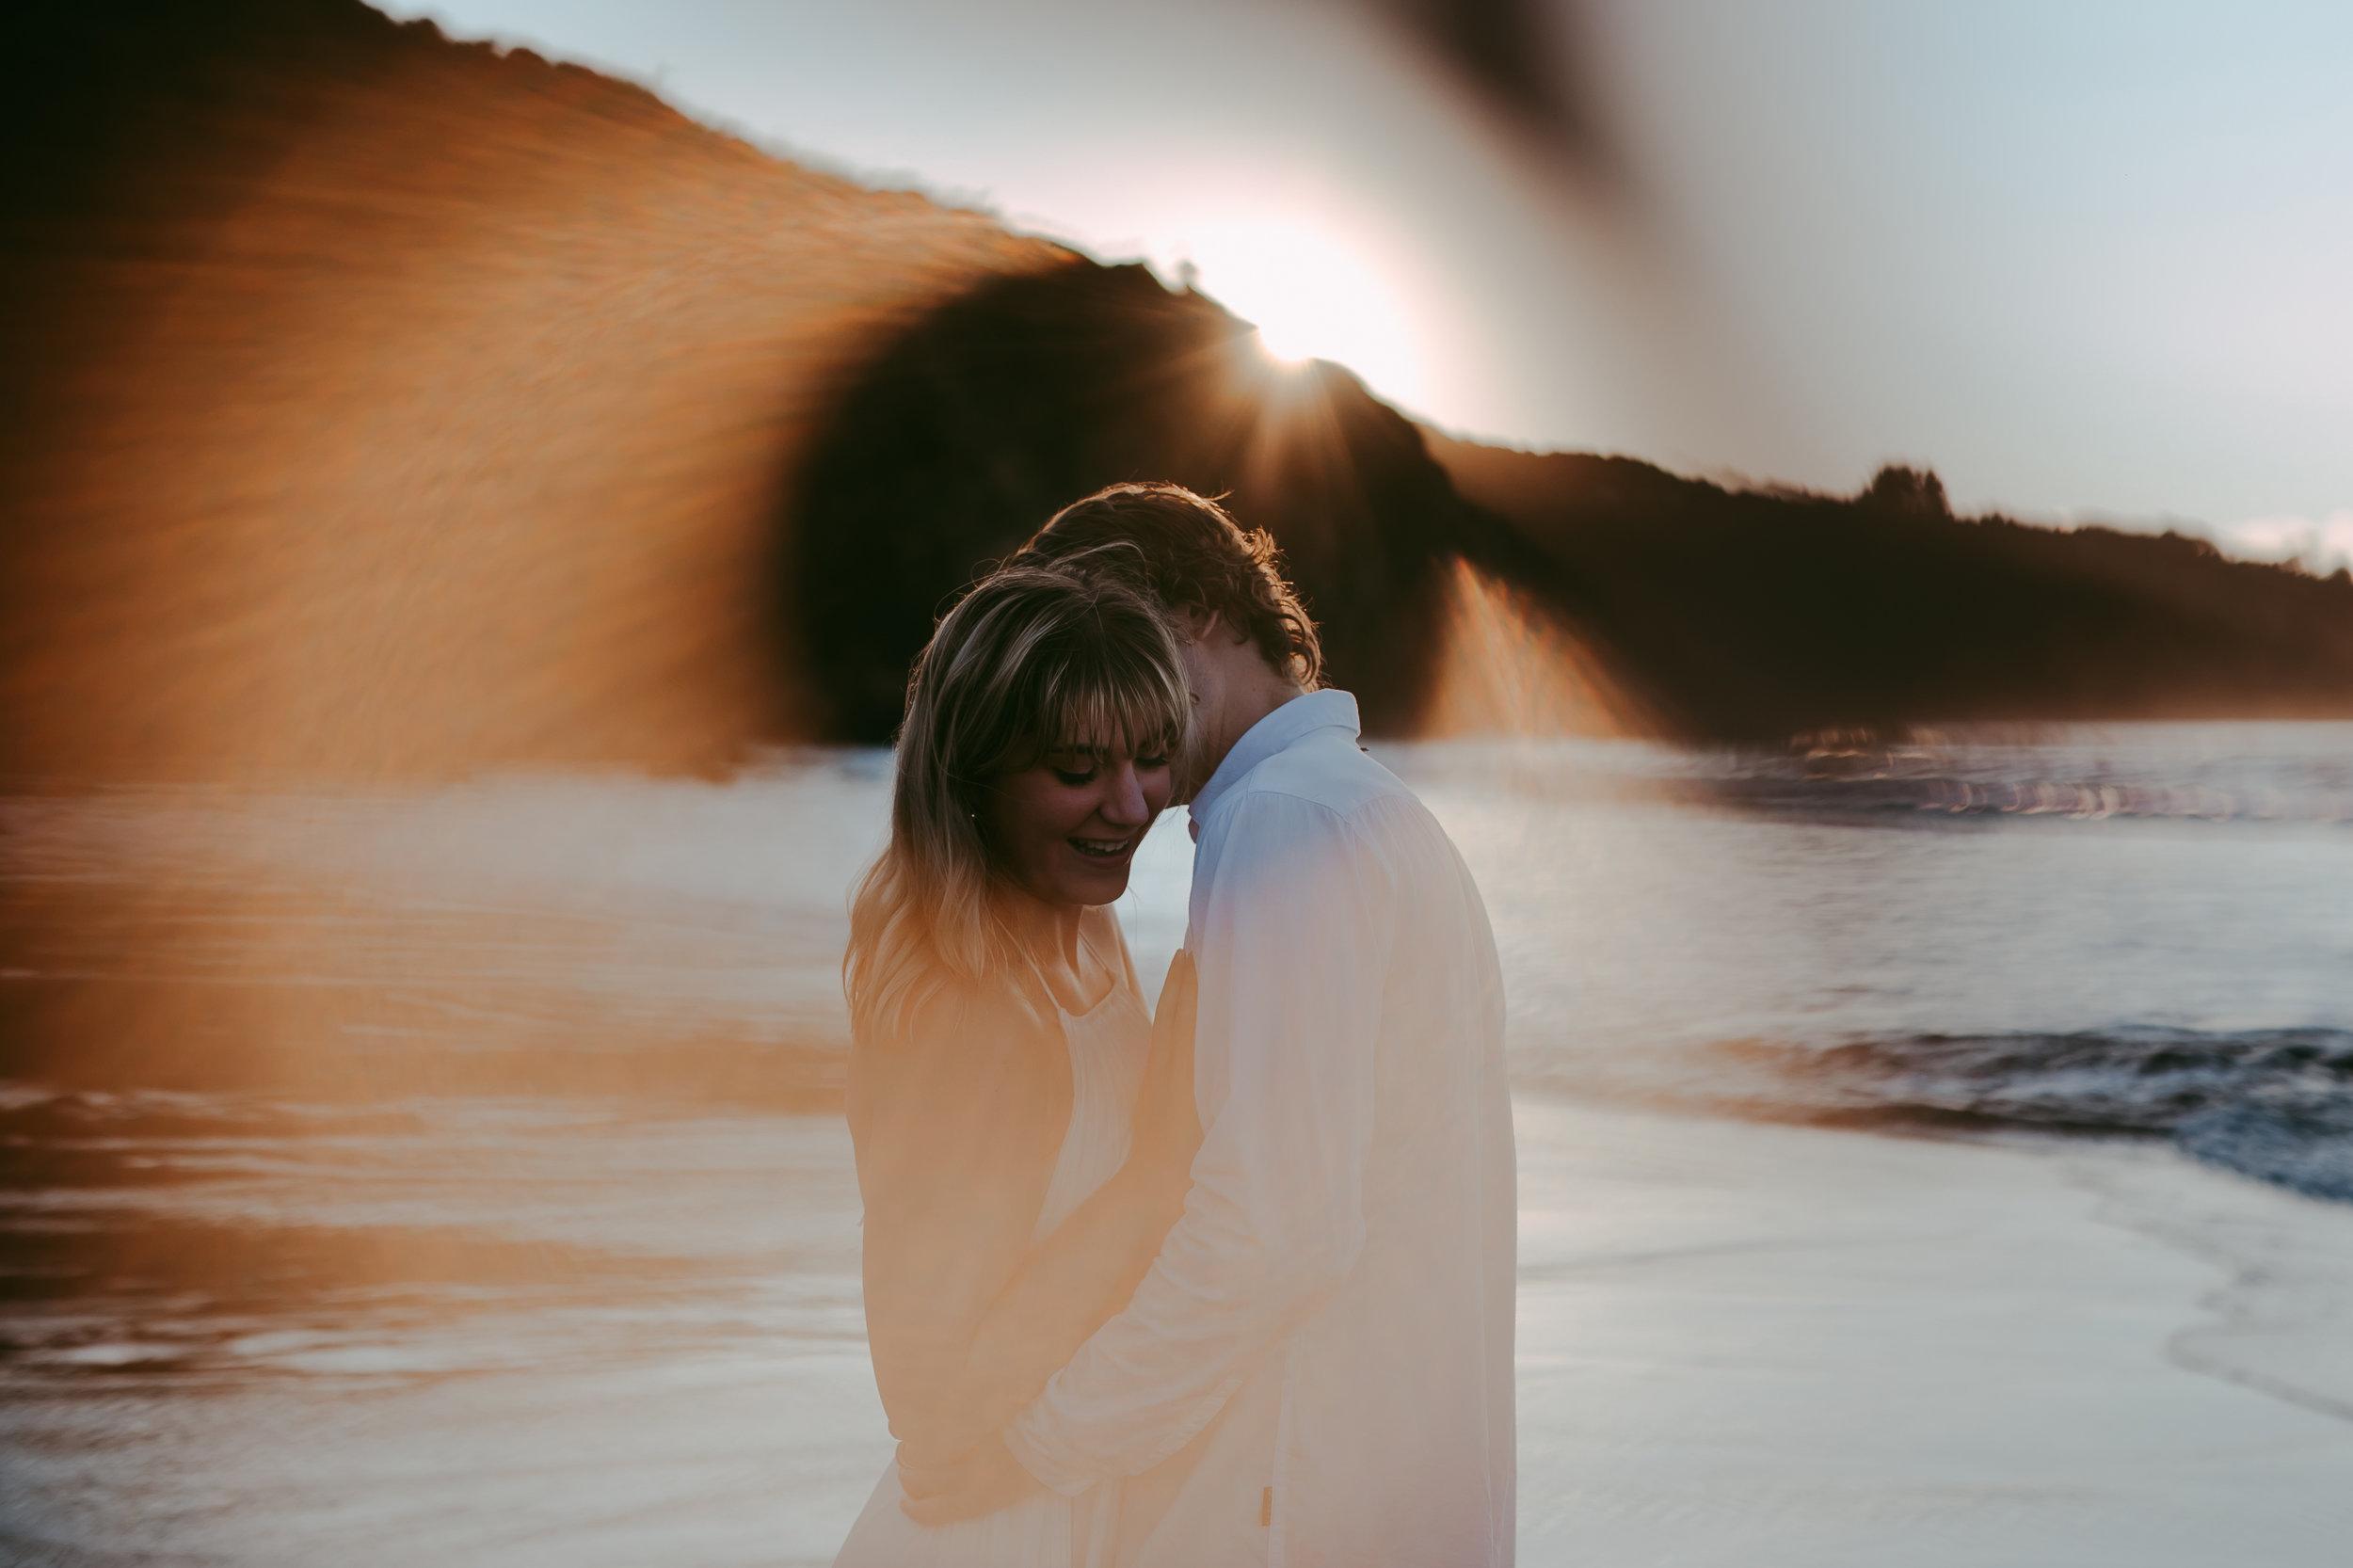 Raglan-beach-couples-engagement-photo-shoot (2 of 2).jpg